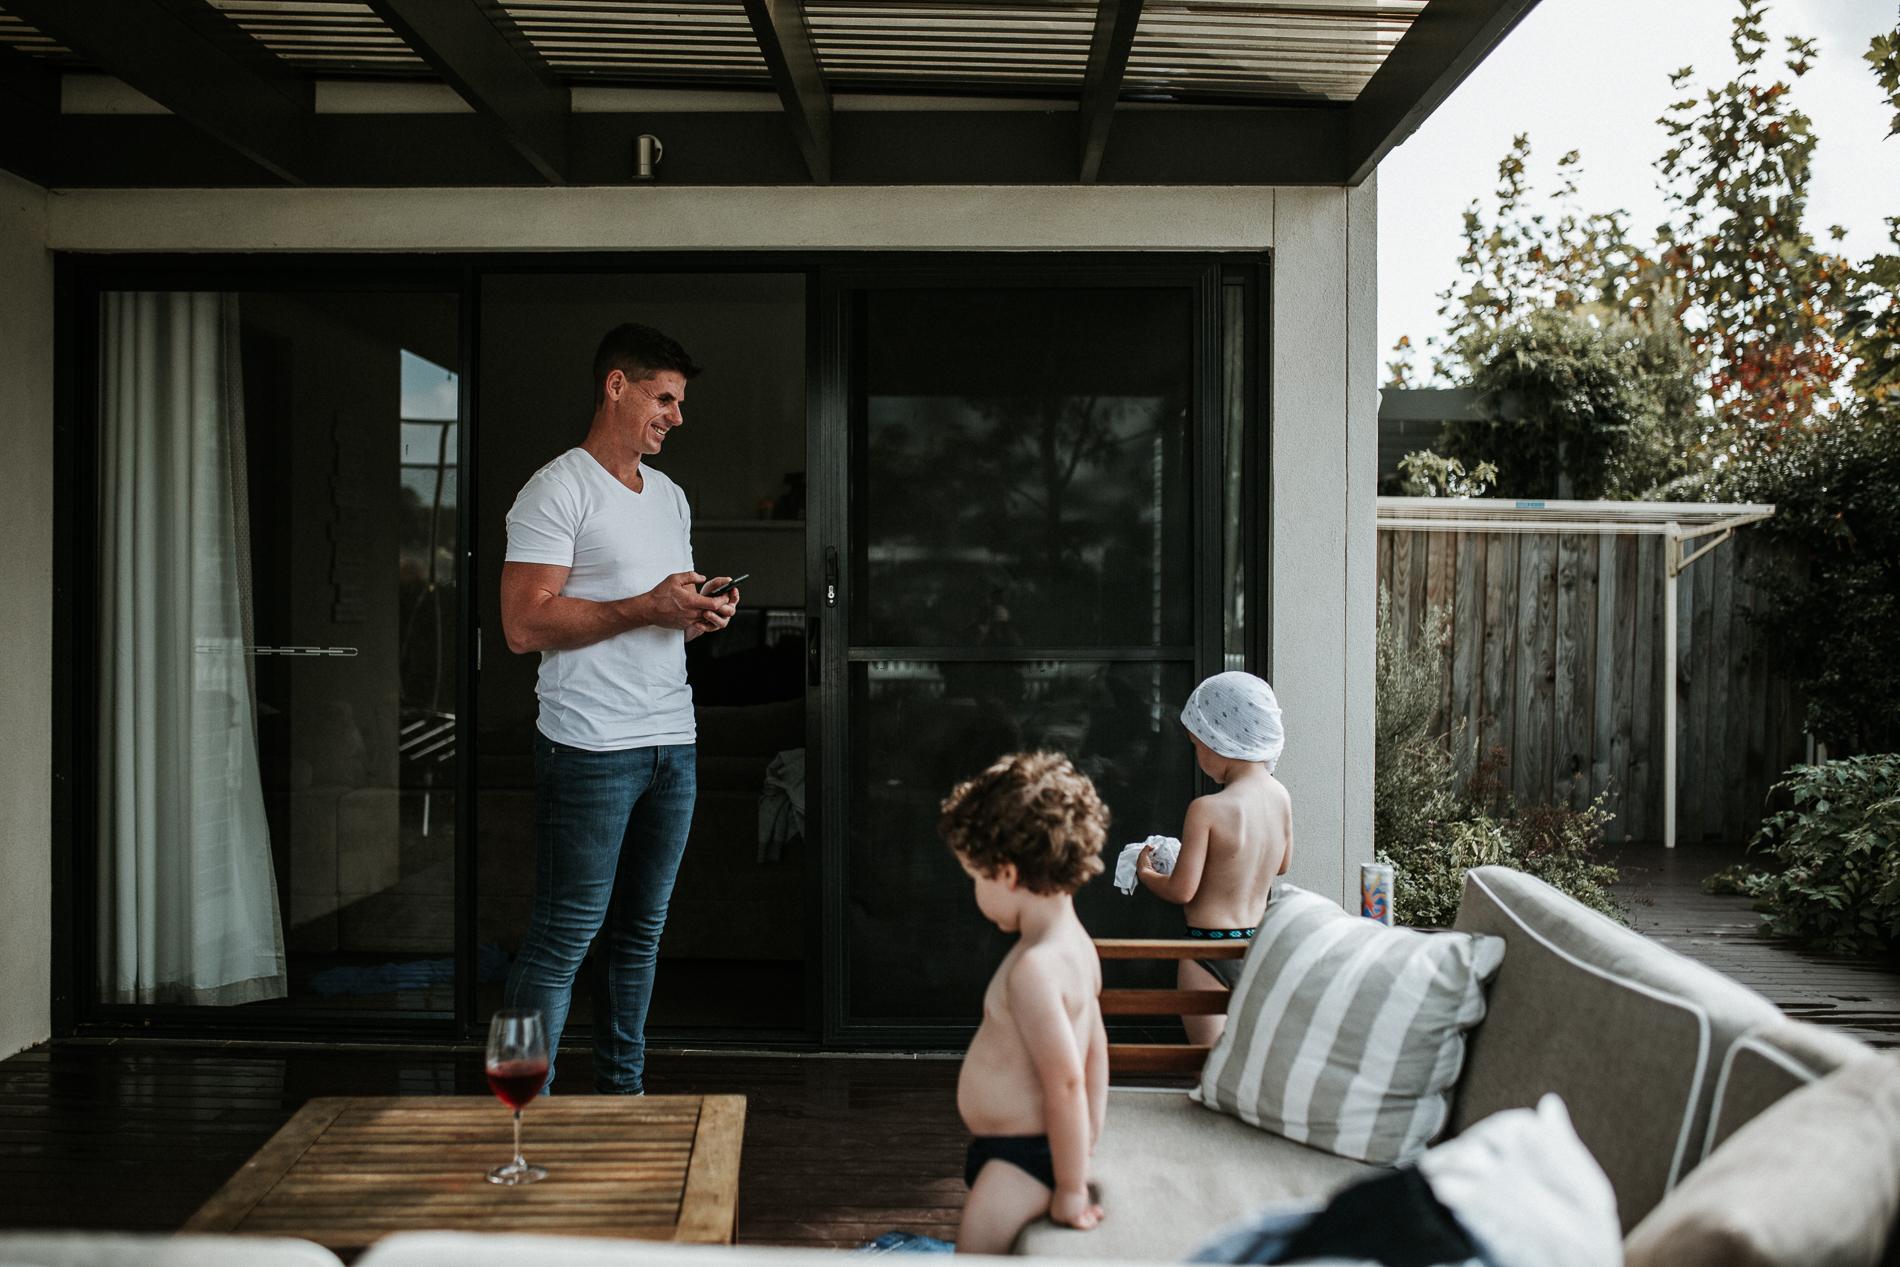 20170518_Sydney_Family_Photographer_ 7269.jpg